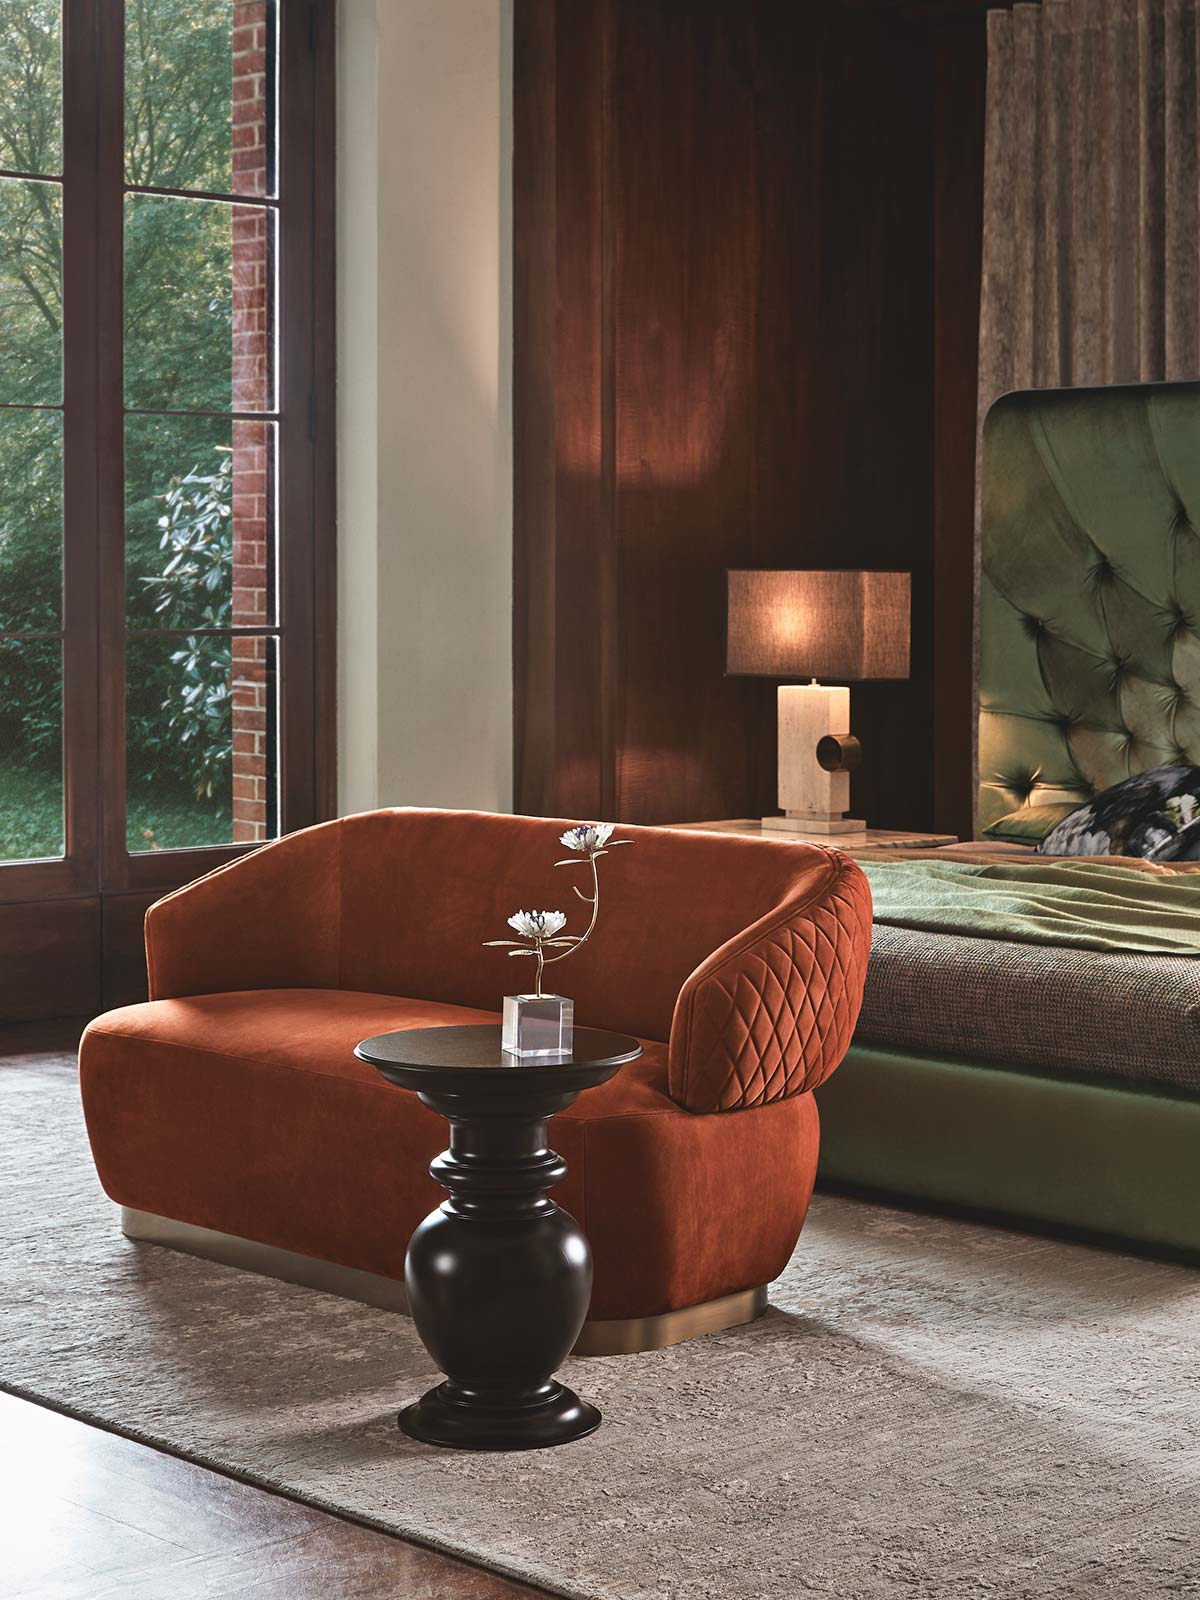 Sophie sofa & Pelléas side table by Opera Contemporary - Design Castello Lagravinese Studio